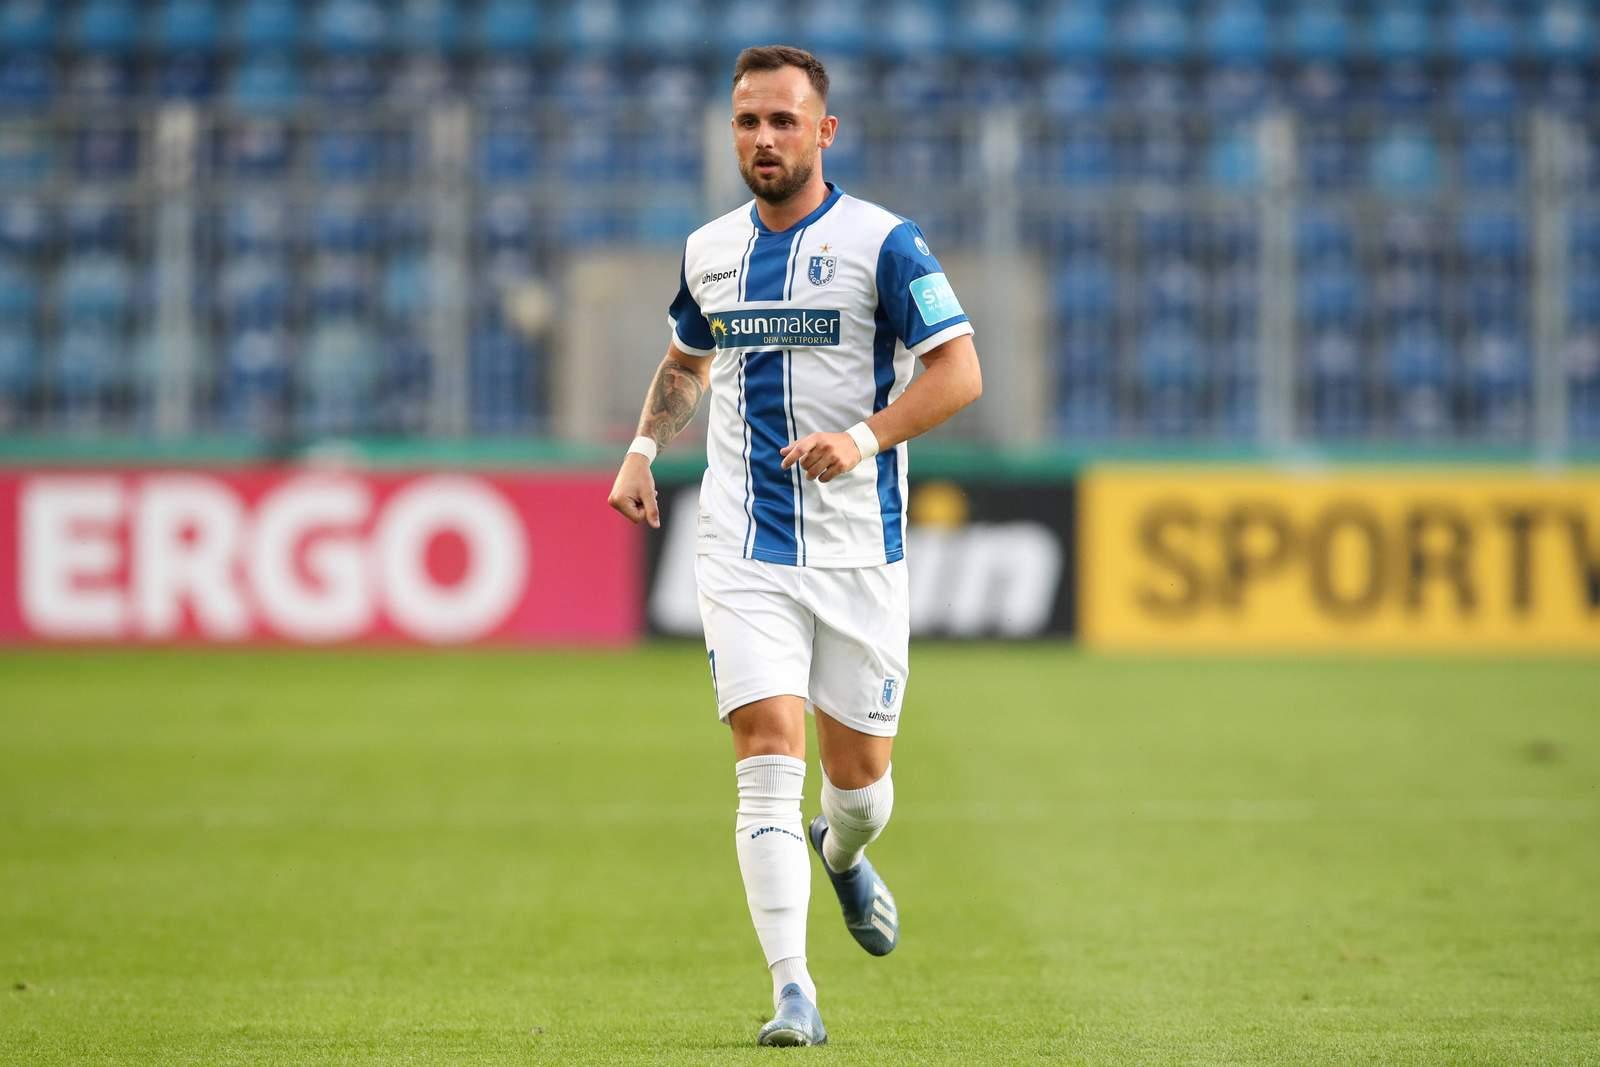 Luka Sliskovic im Pokal gegen Darmstadt.